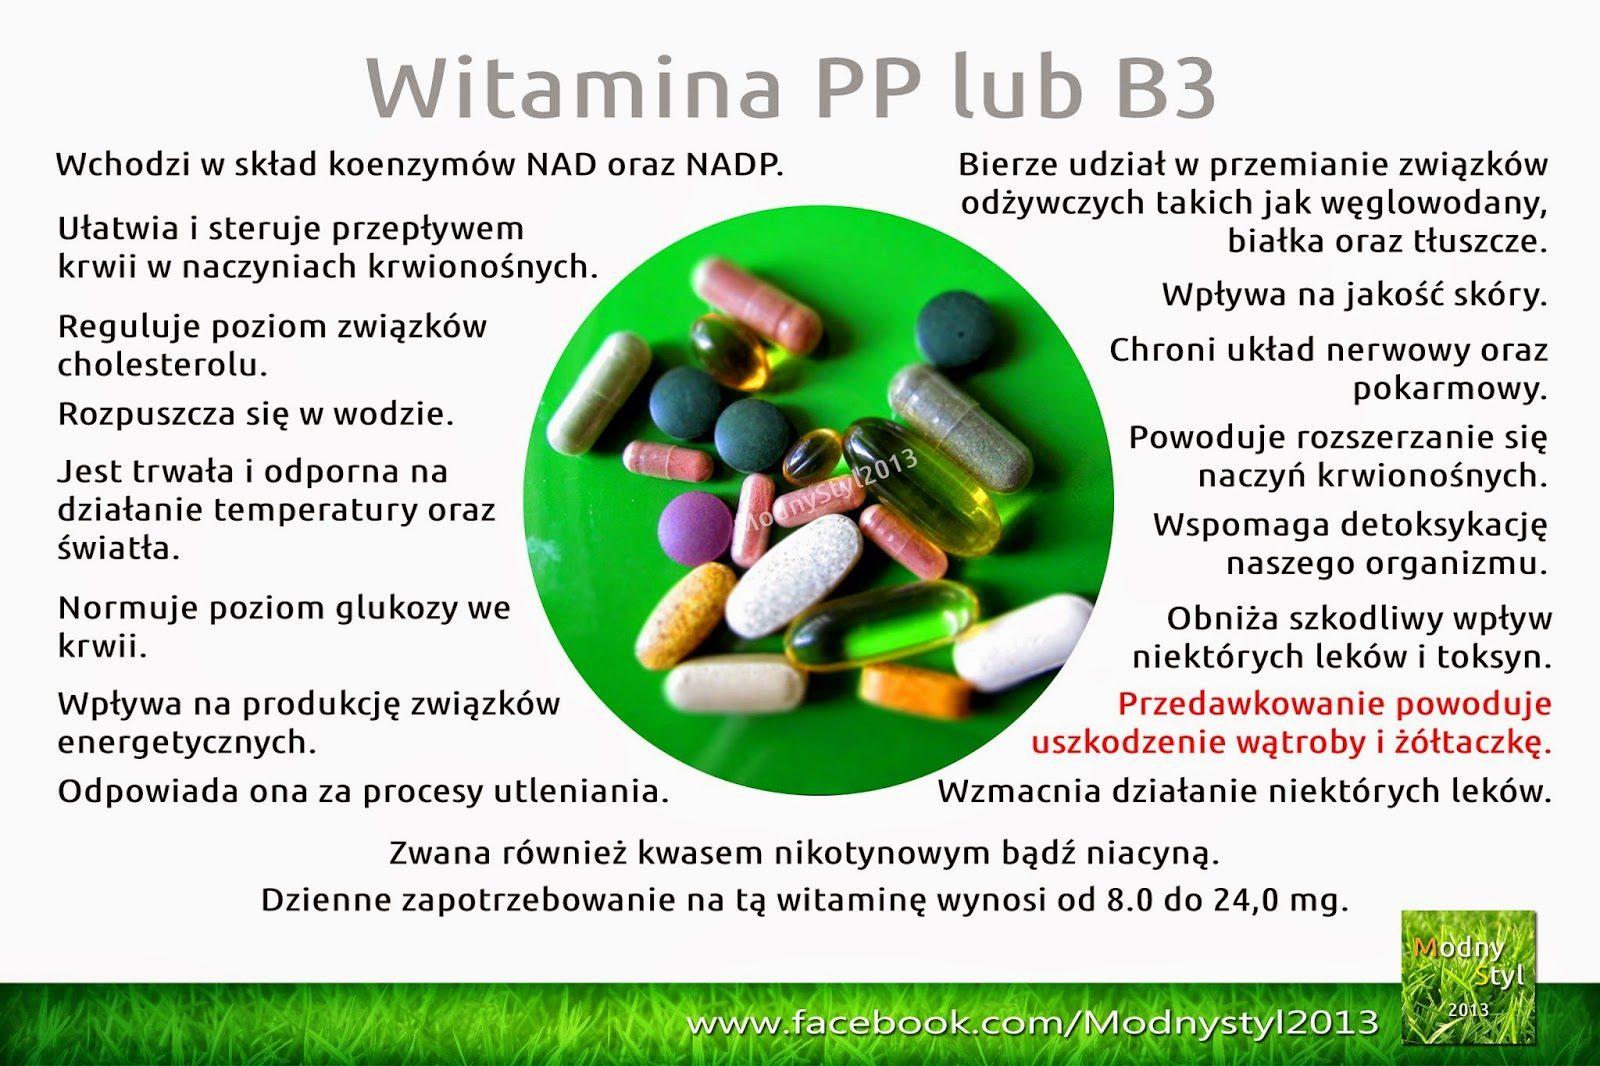 witamina2bpp-7021790